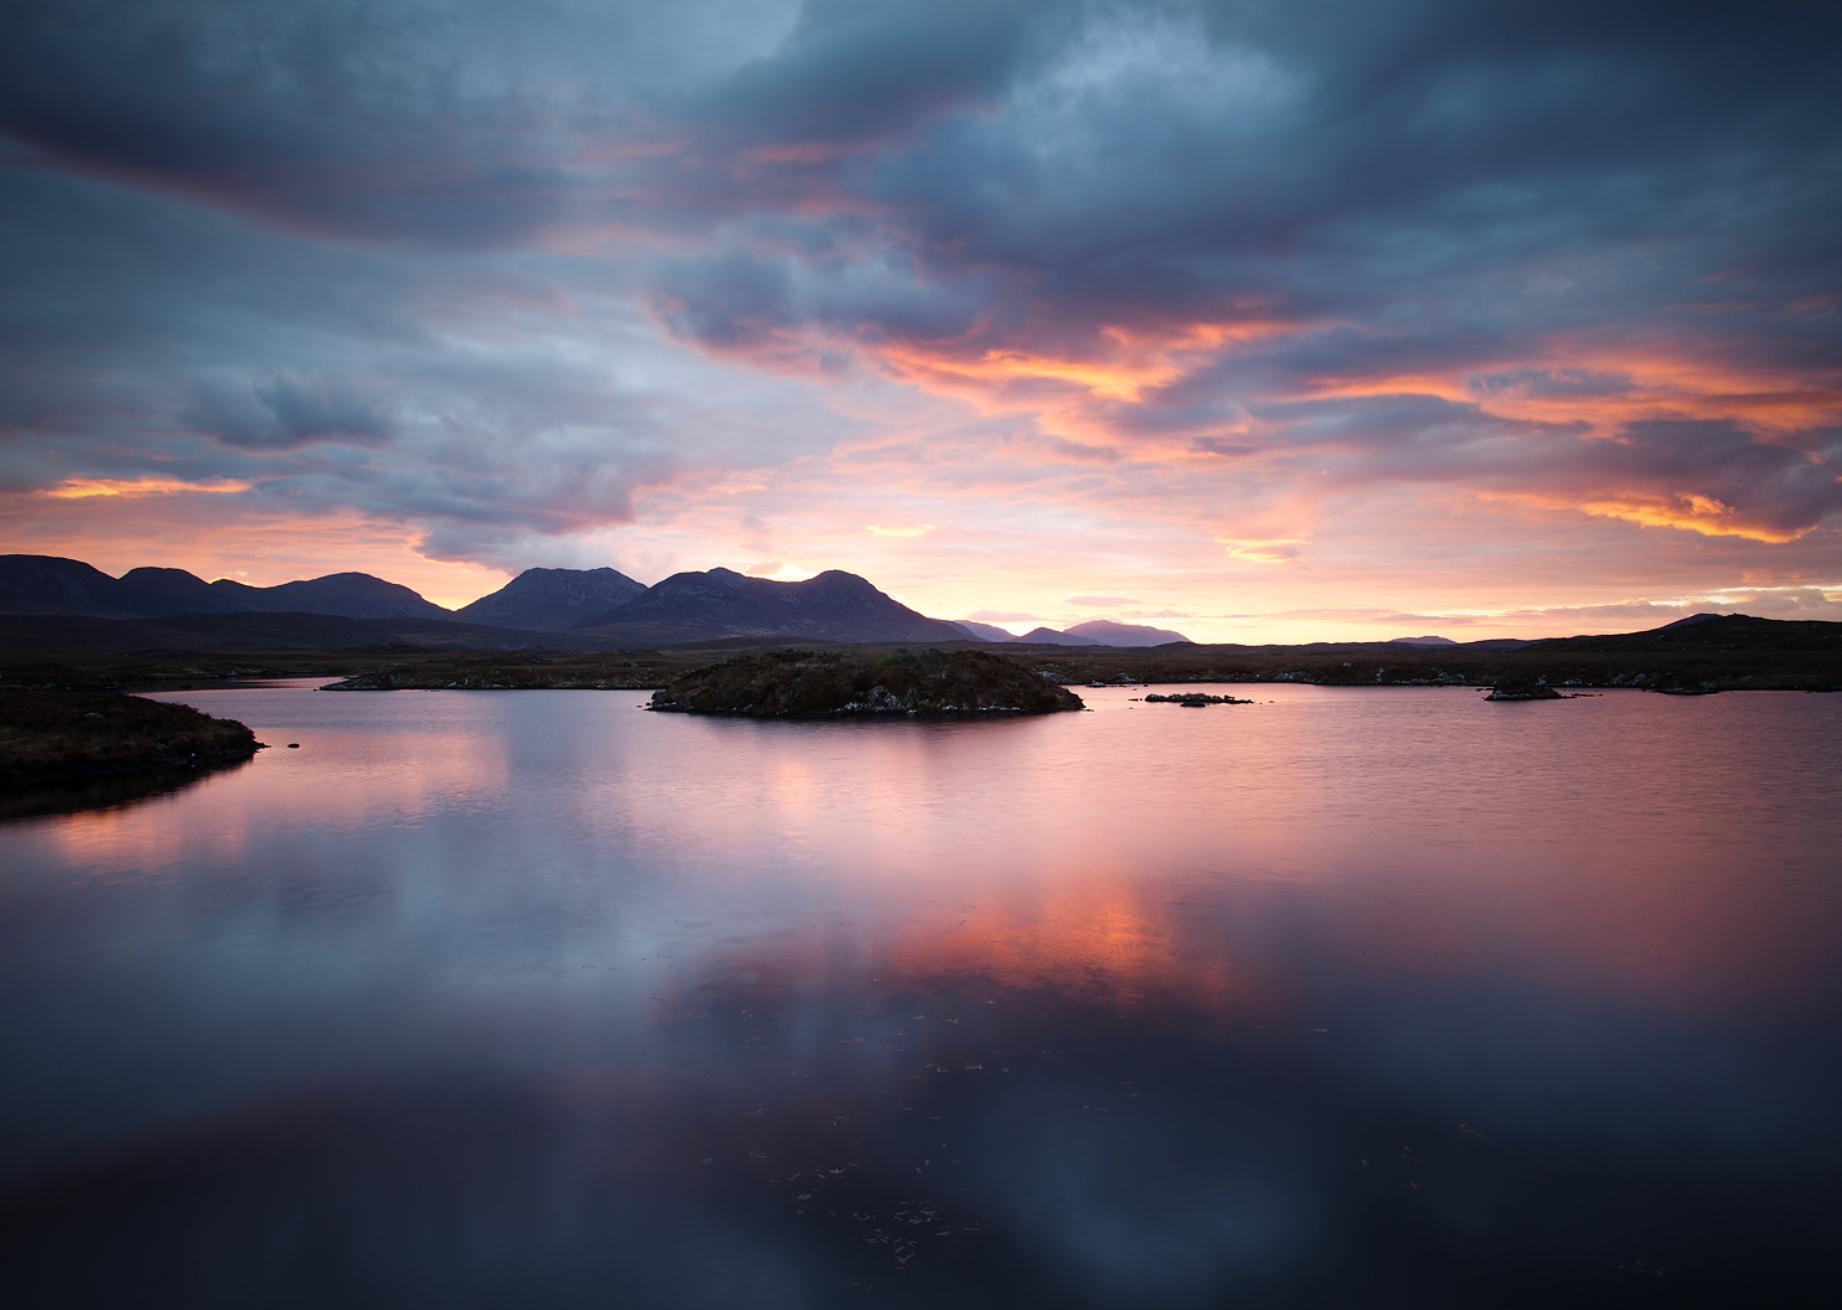 Donegal-Muckross Head.jpg